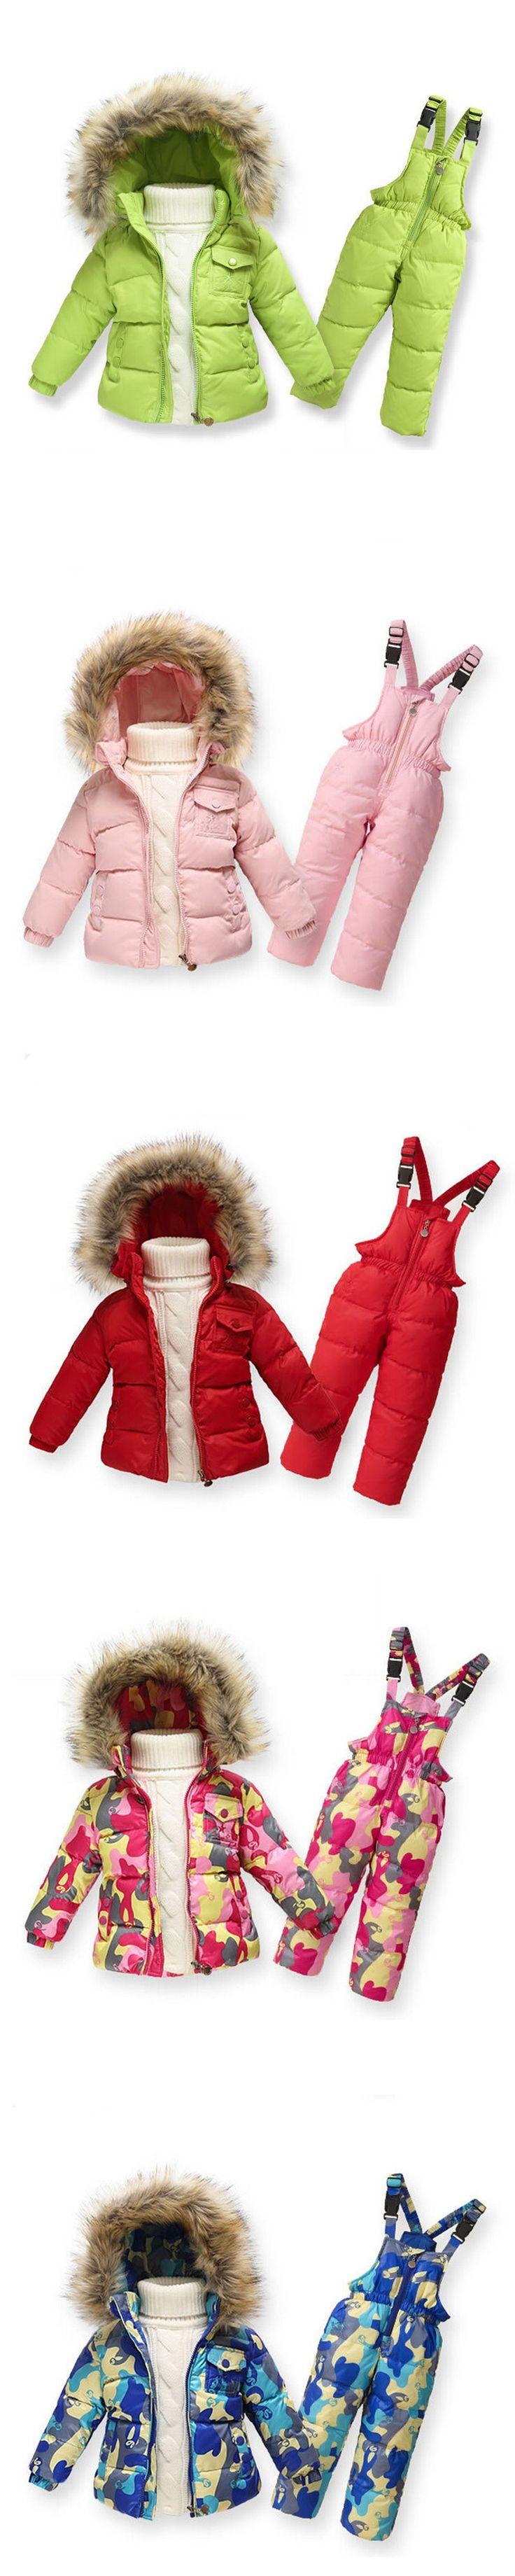 Children Winter Clothing set 2016 Fashion Boys Ski Suit Girl Down Jacket Coat + Jumpsuit Set Kids Clothes For Baby Boy Girl Suit